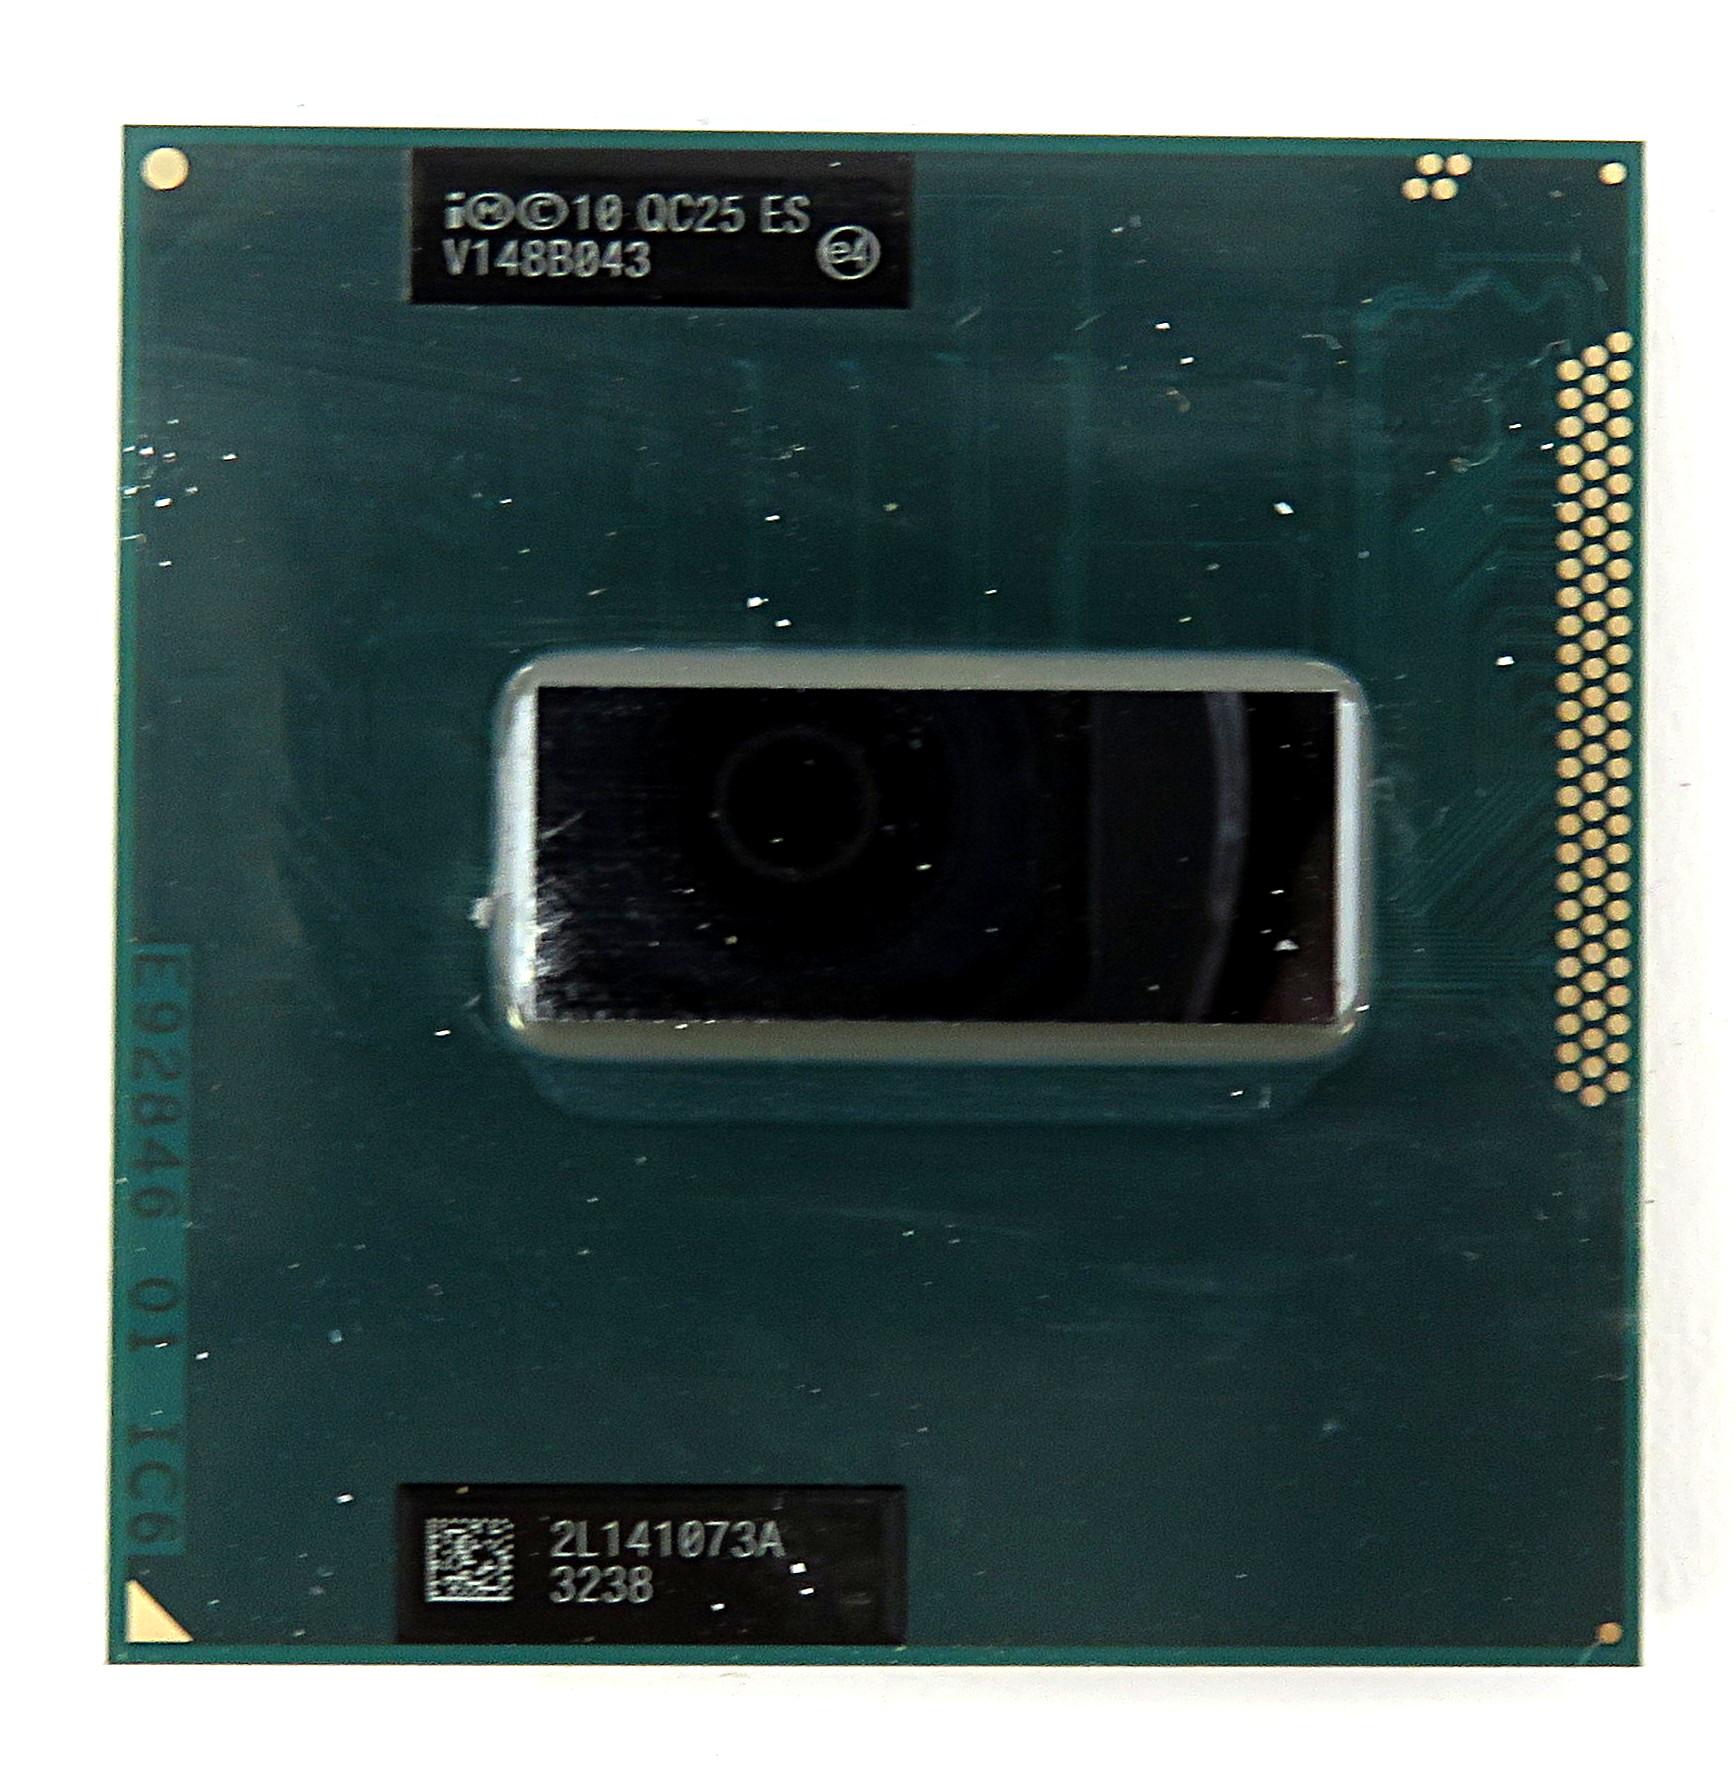 Intel Engineering/Qualification Sample CPU QC25 Socket rPGA988B i7-3720QM